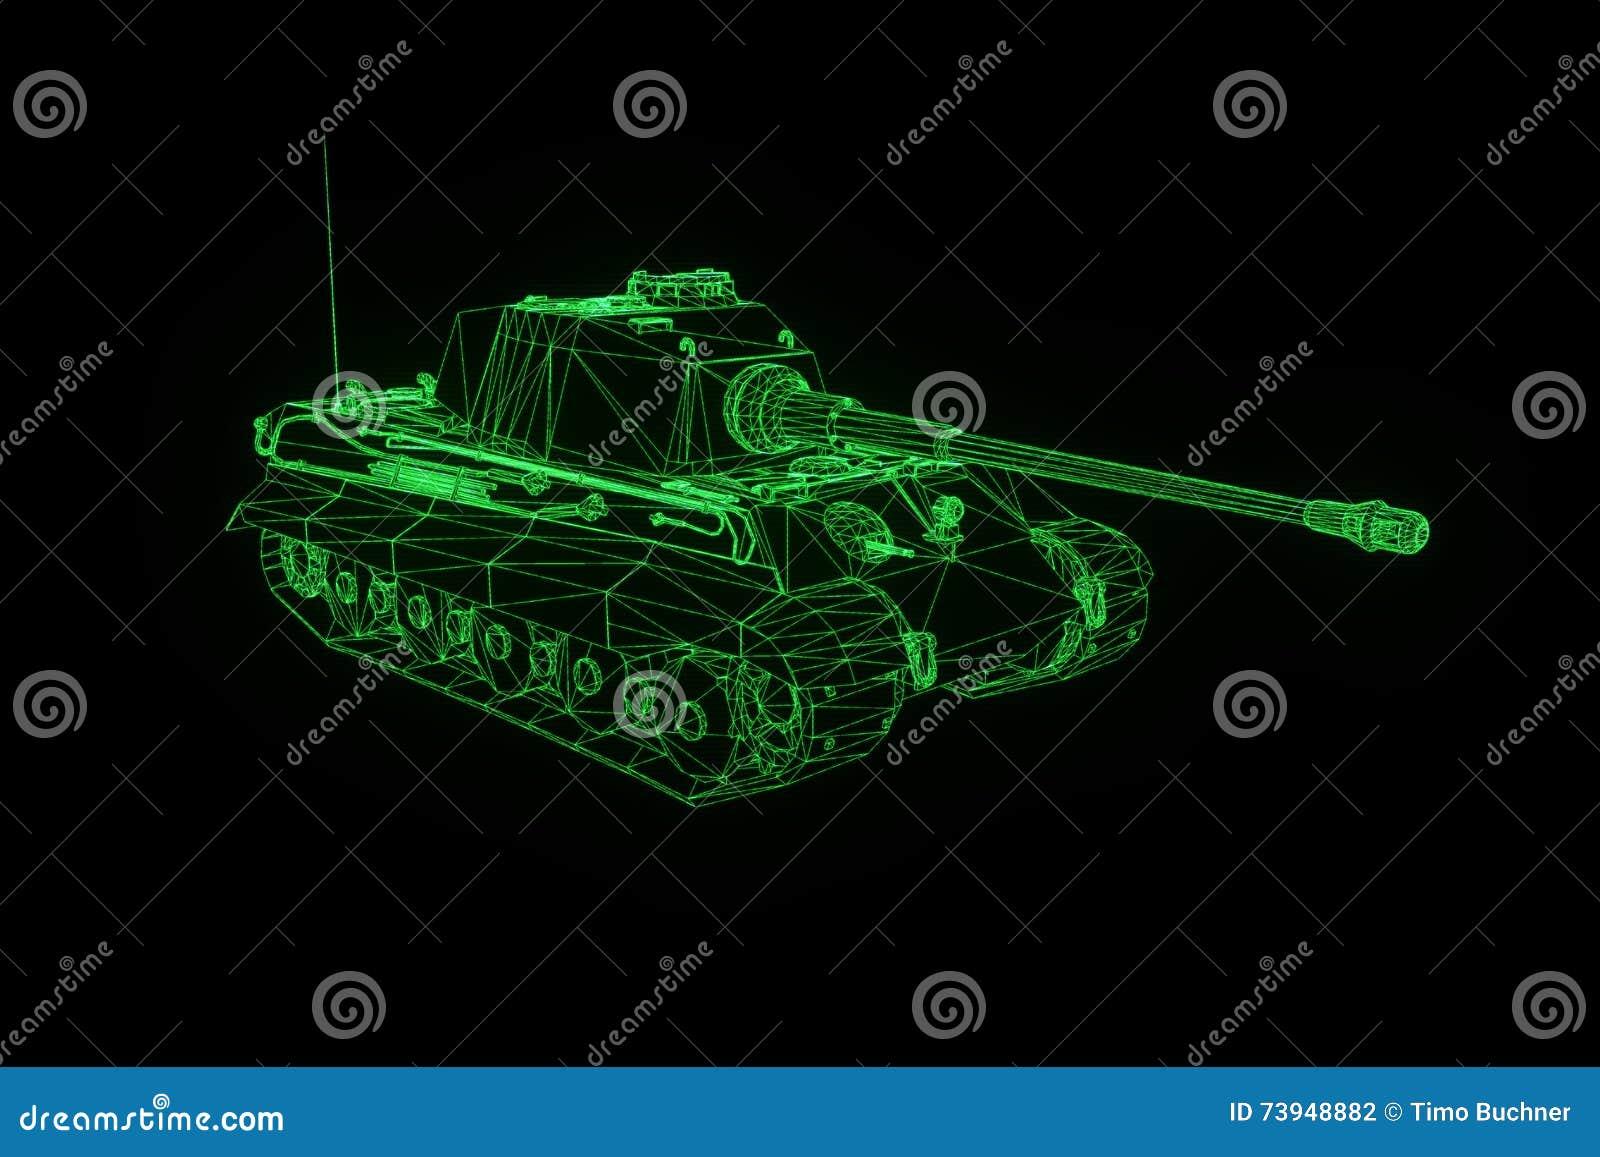 3D Tank Hologram Wireframe In Motion  Nice 3D Rendering